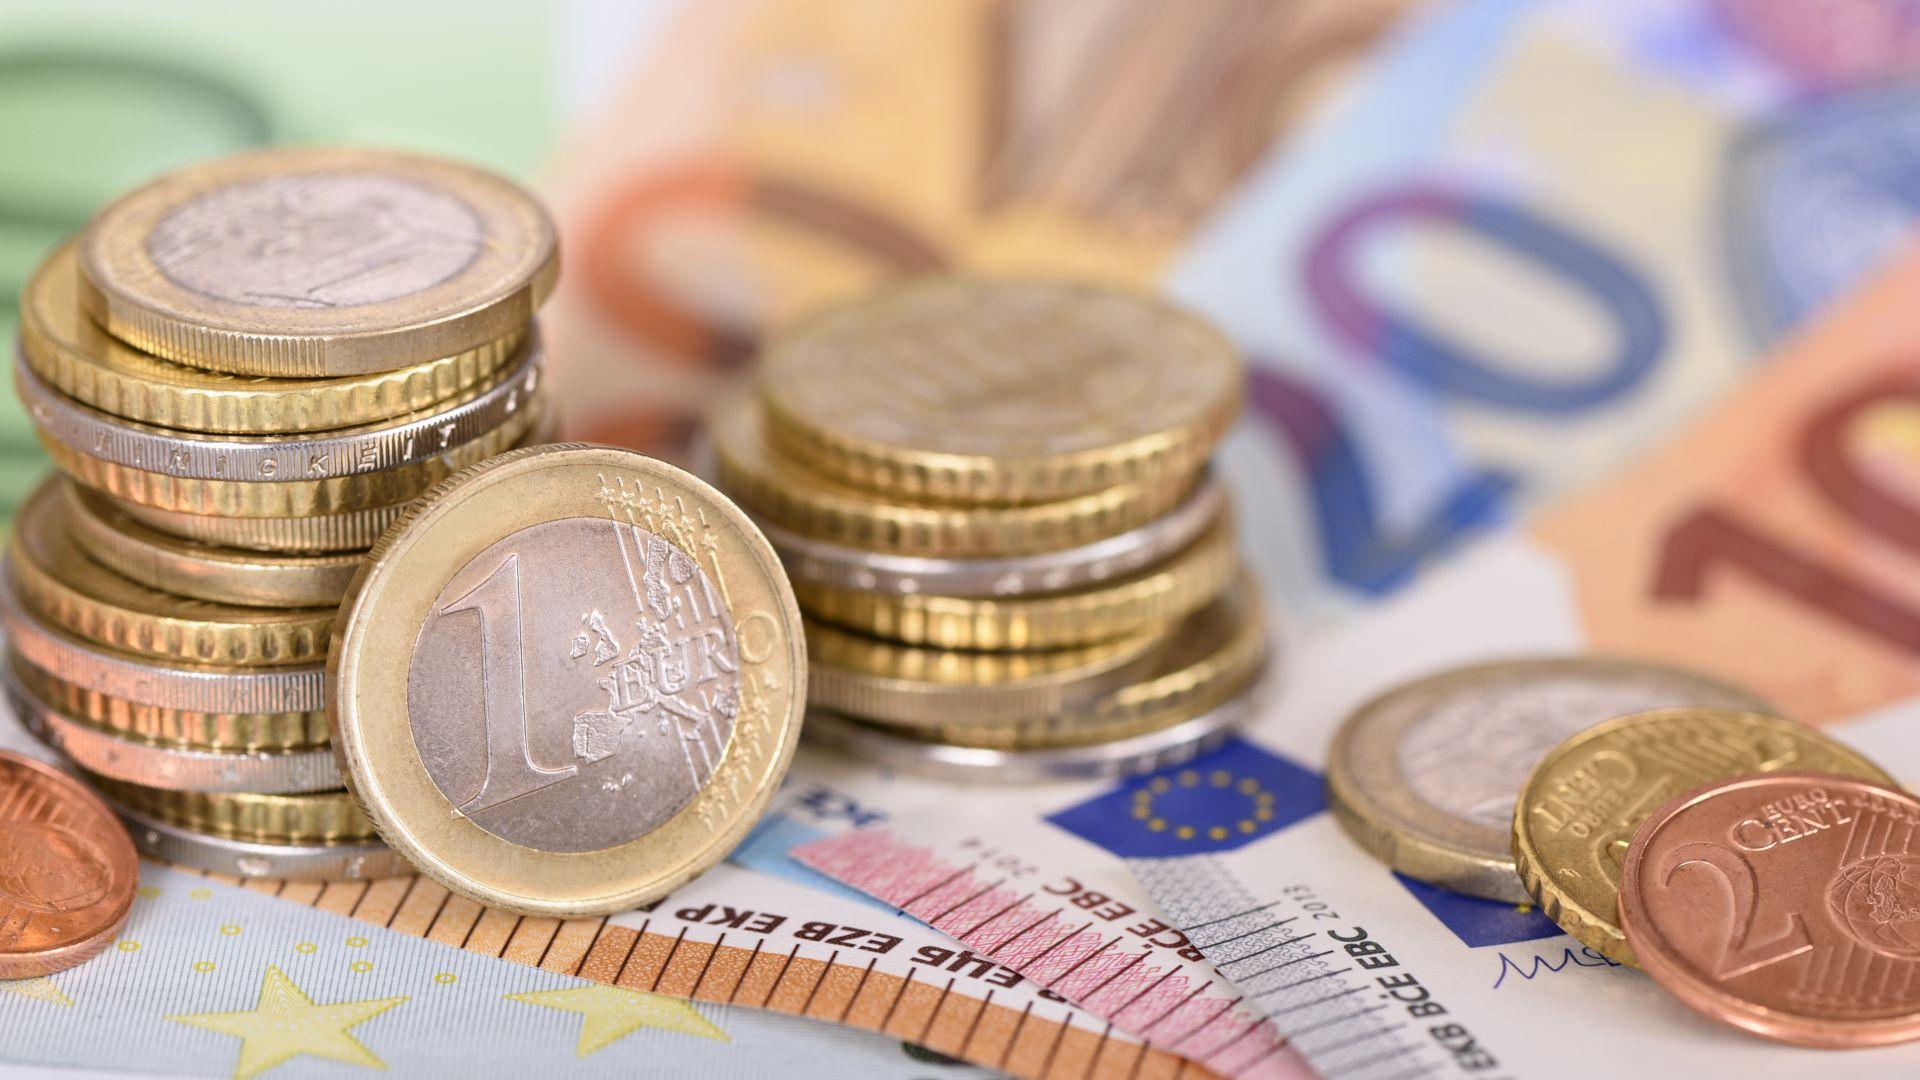 schuldsaldoverzekering Lommel